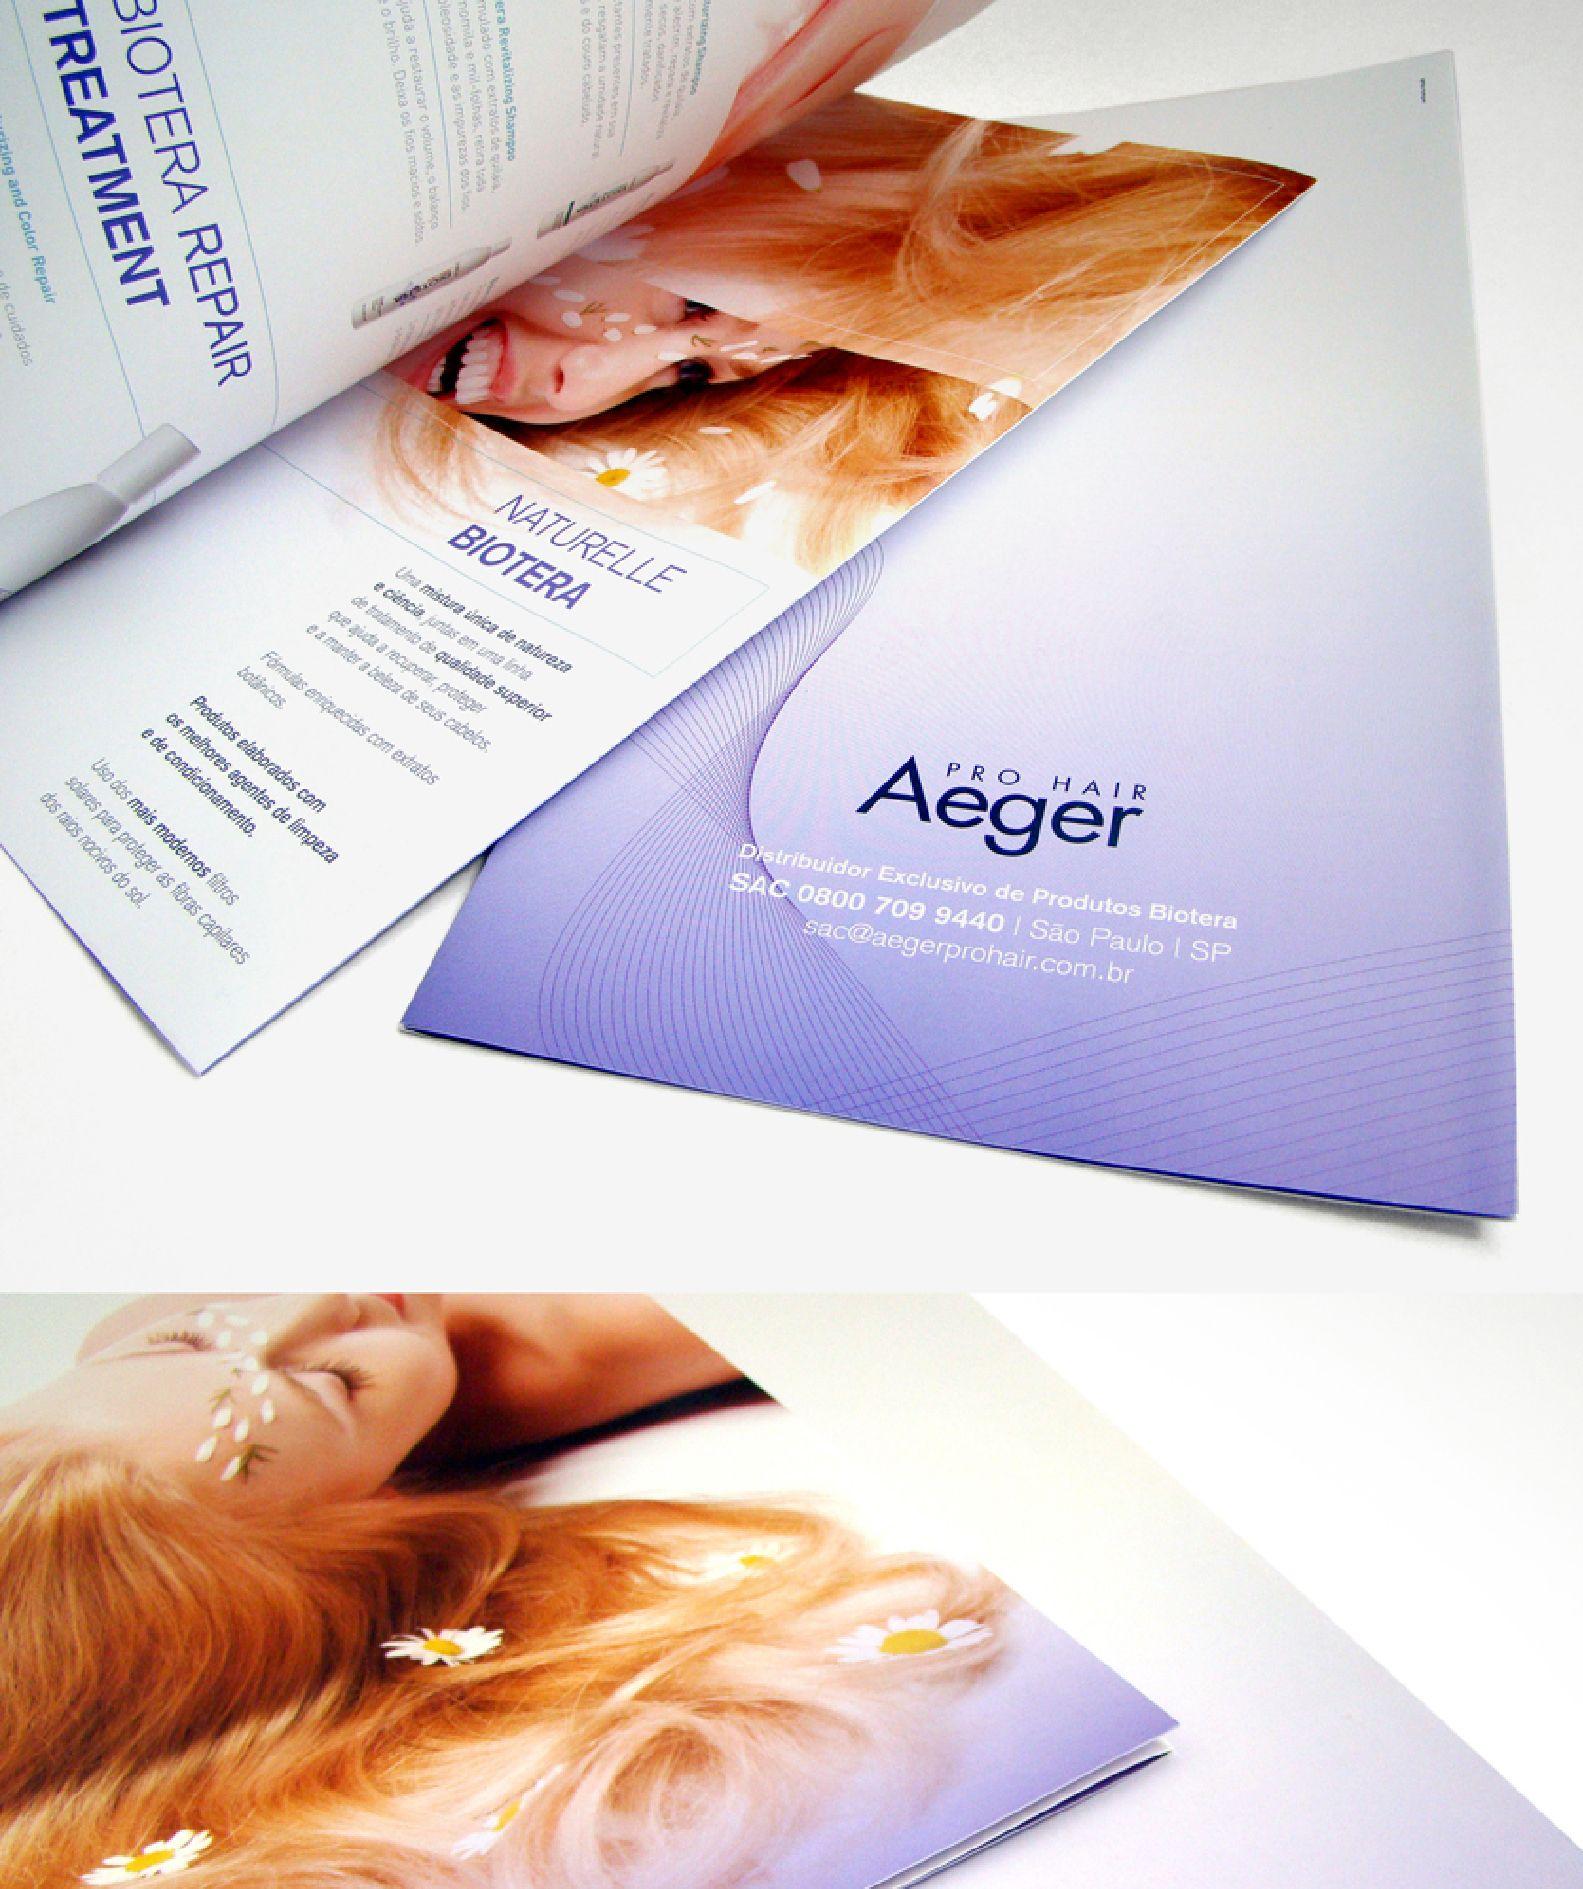 Lançamento Biotera, para Aeger Pro Hair